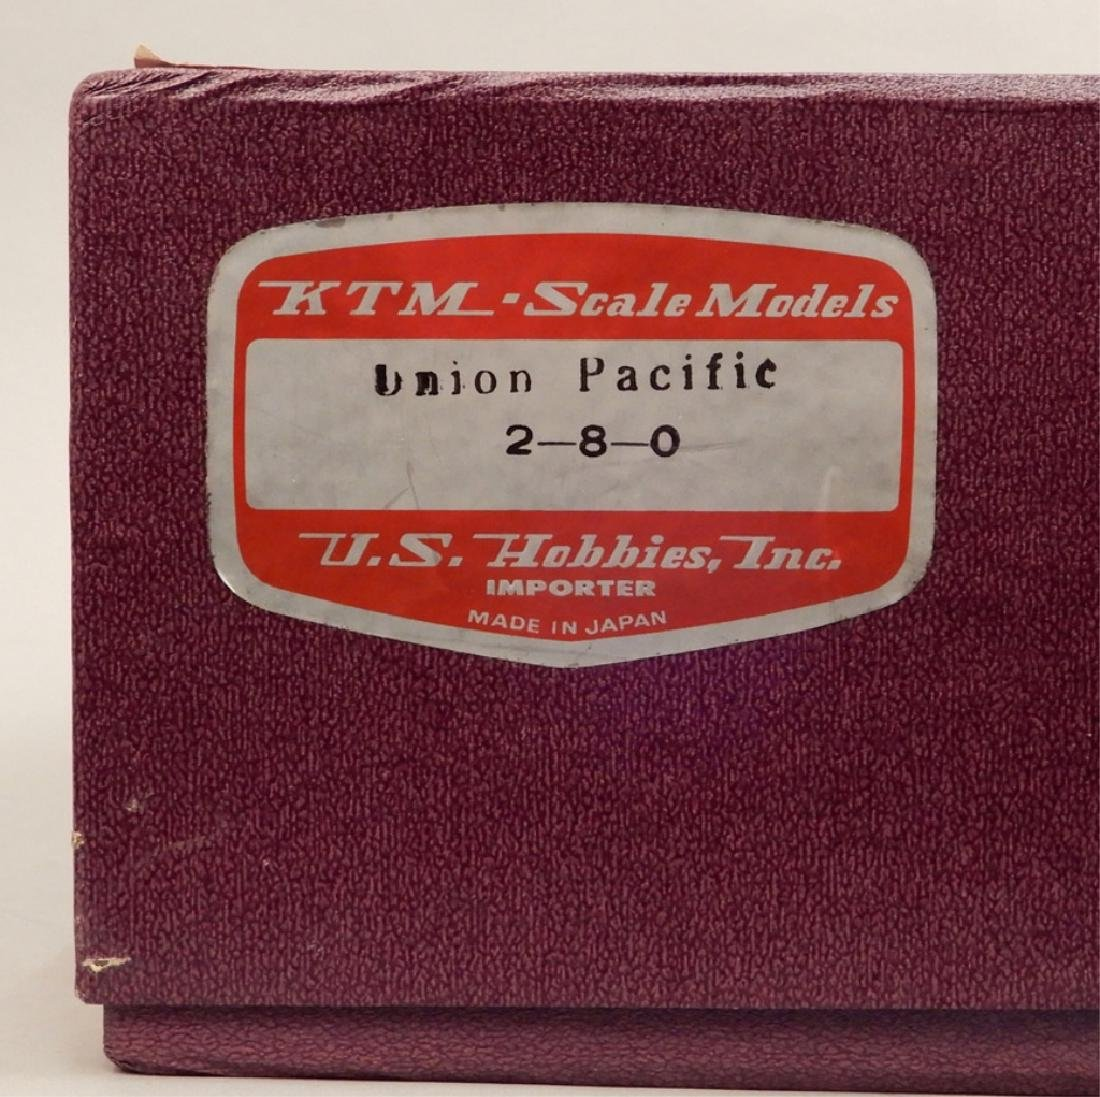 KTM Scale Models Union Pacific 2-8-0 in original box - 2